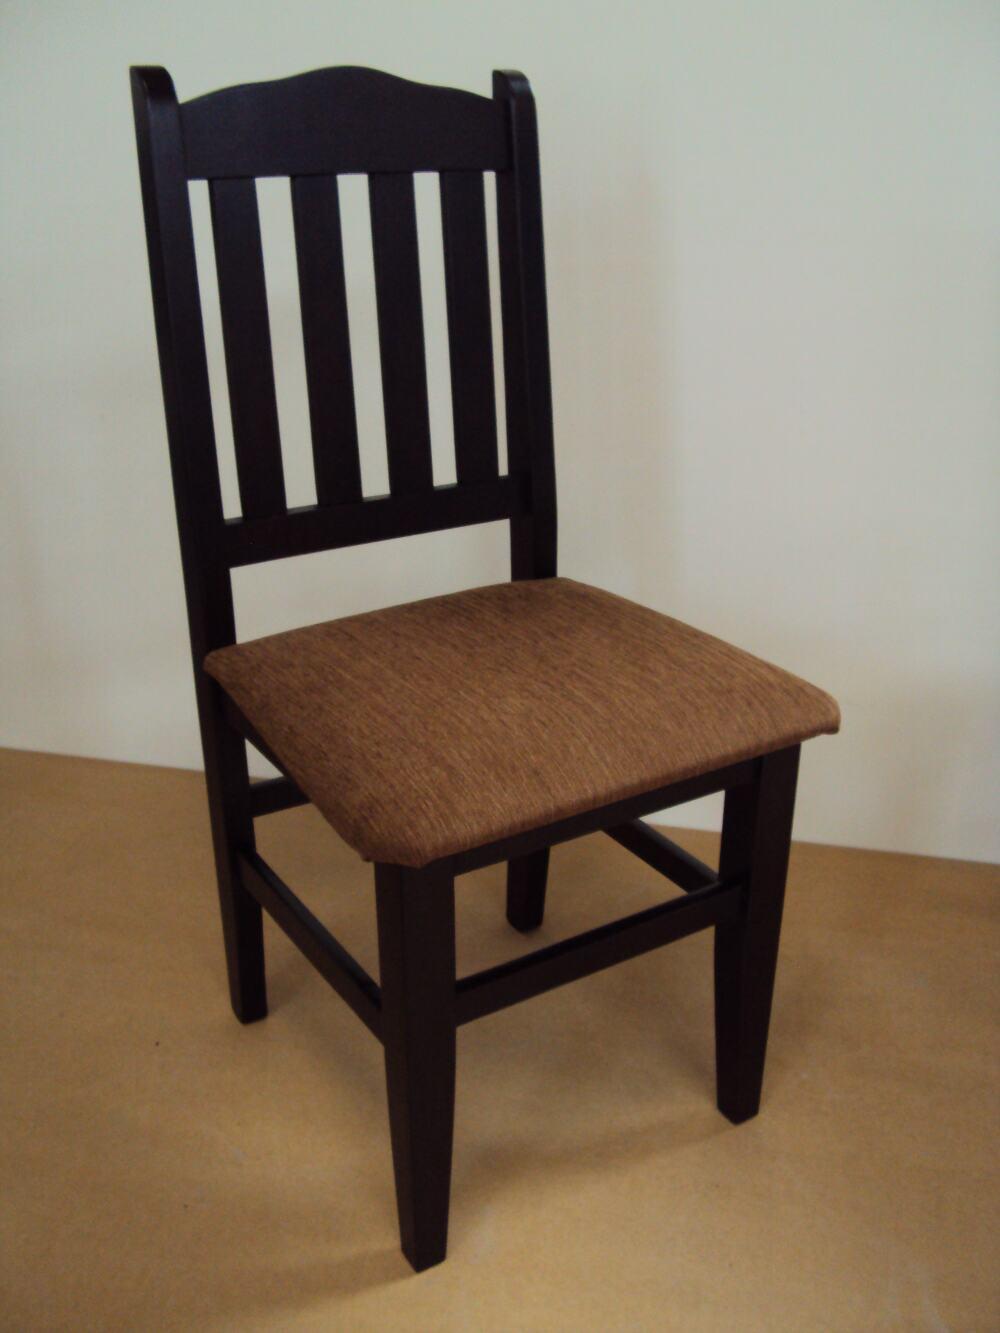 Professional Verona Chair For Restaurant Cafe Tavern